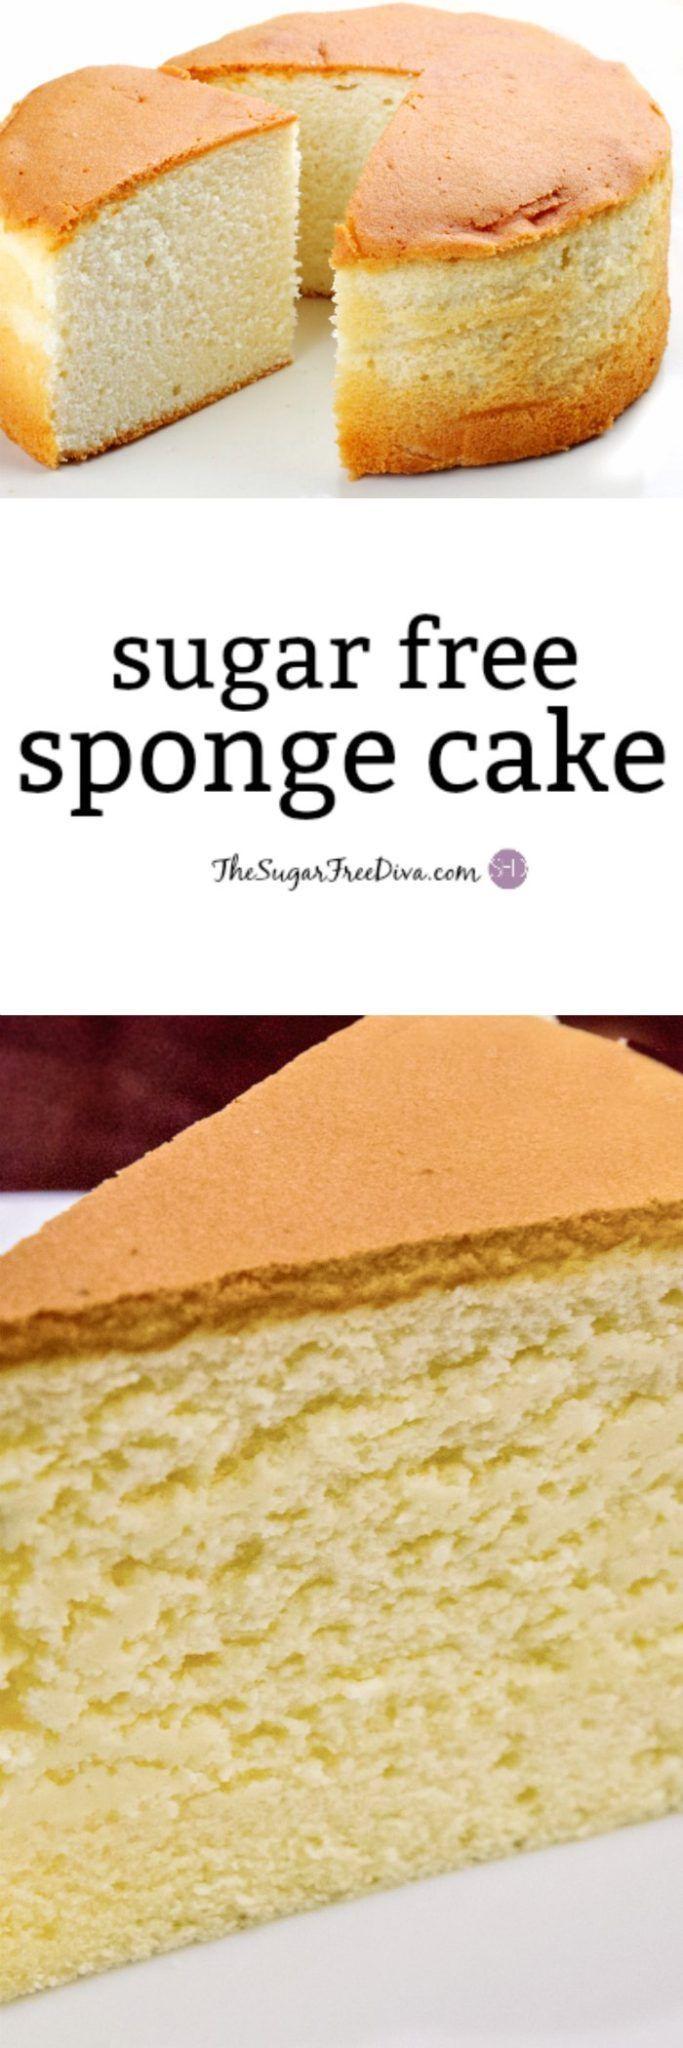 Sugar Free Sponge Cake- the recipe for how to make sugar free sponge cake.